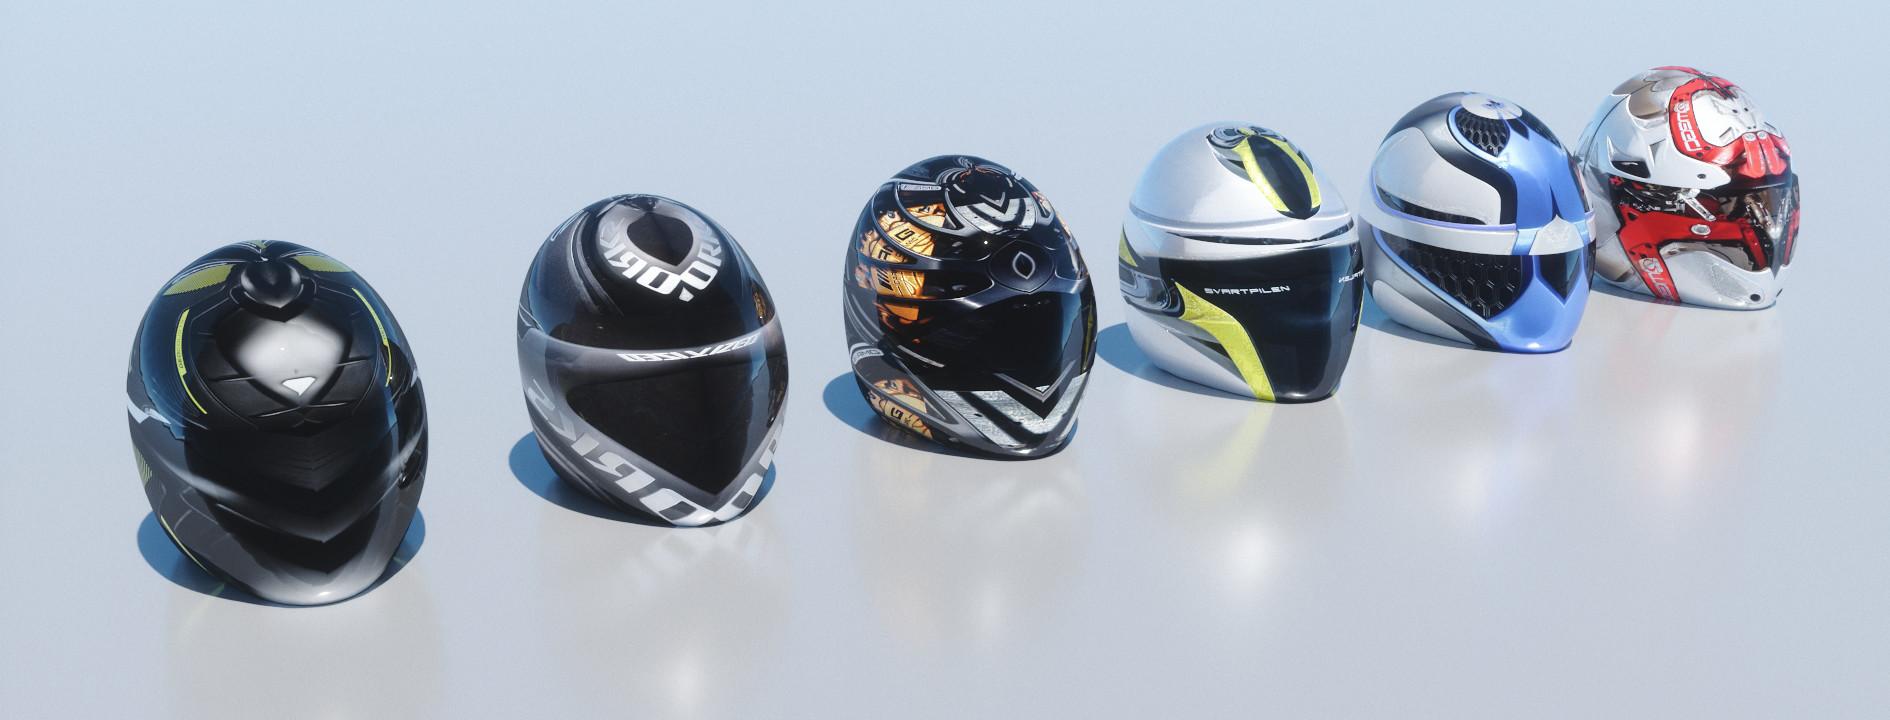 Oleg zherebin helmets2